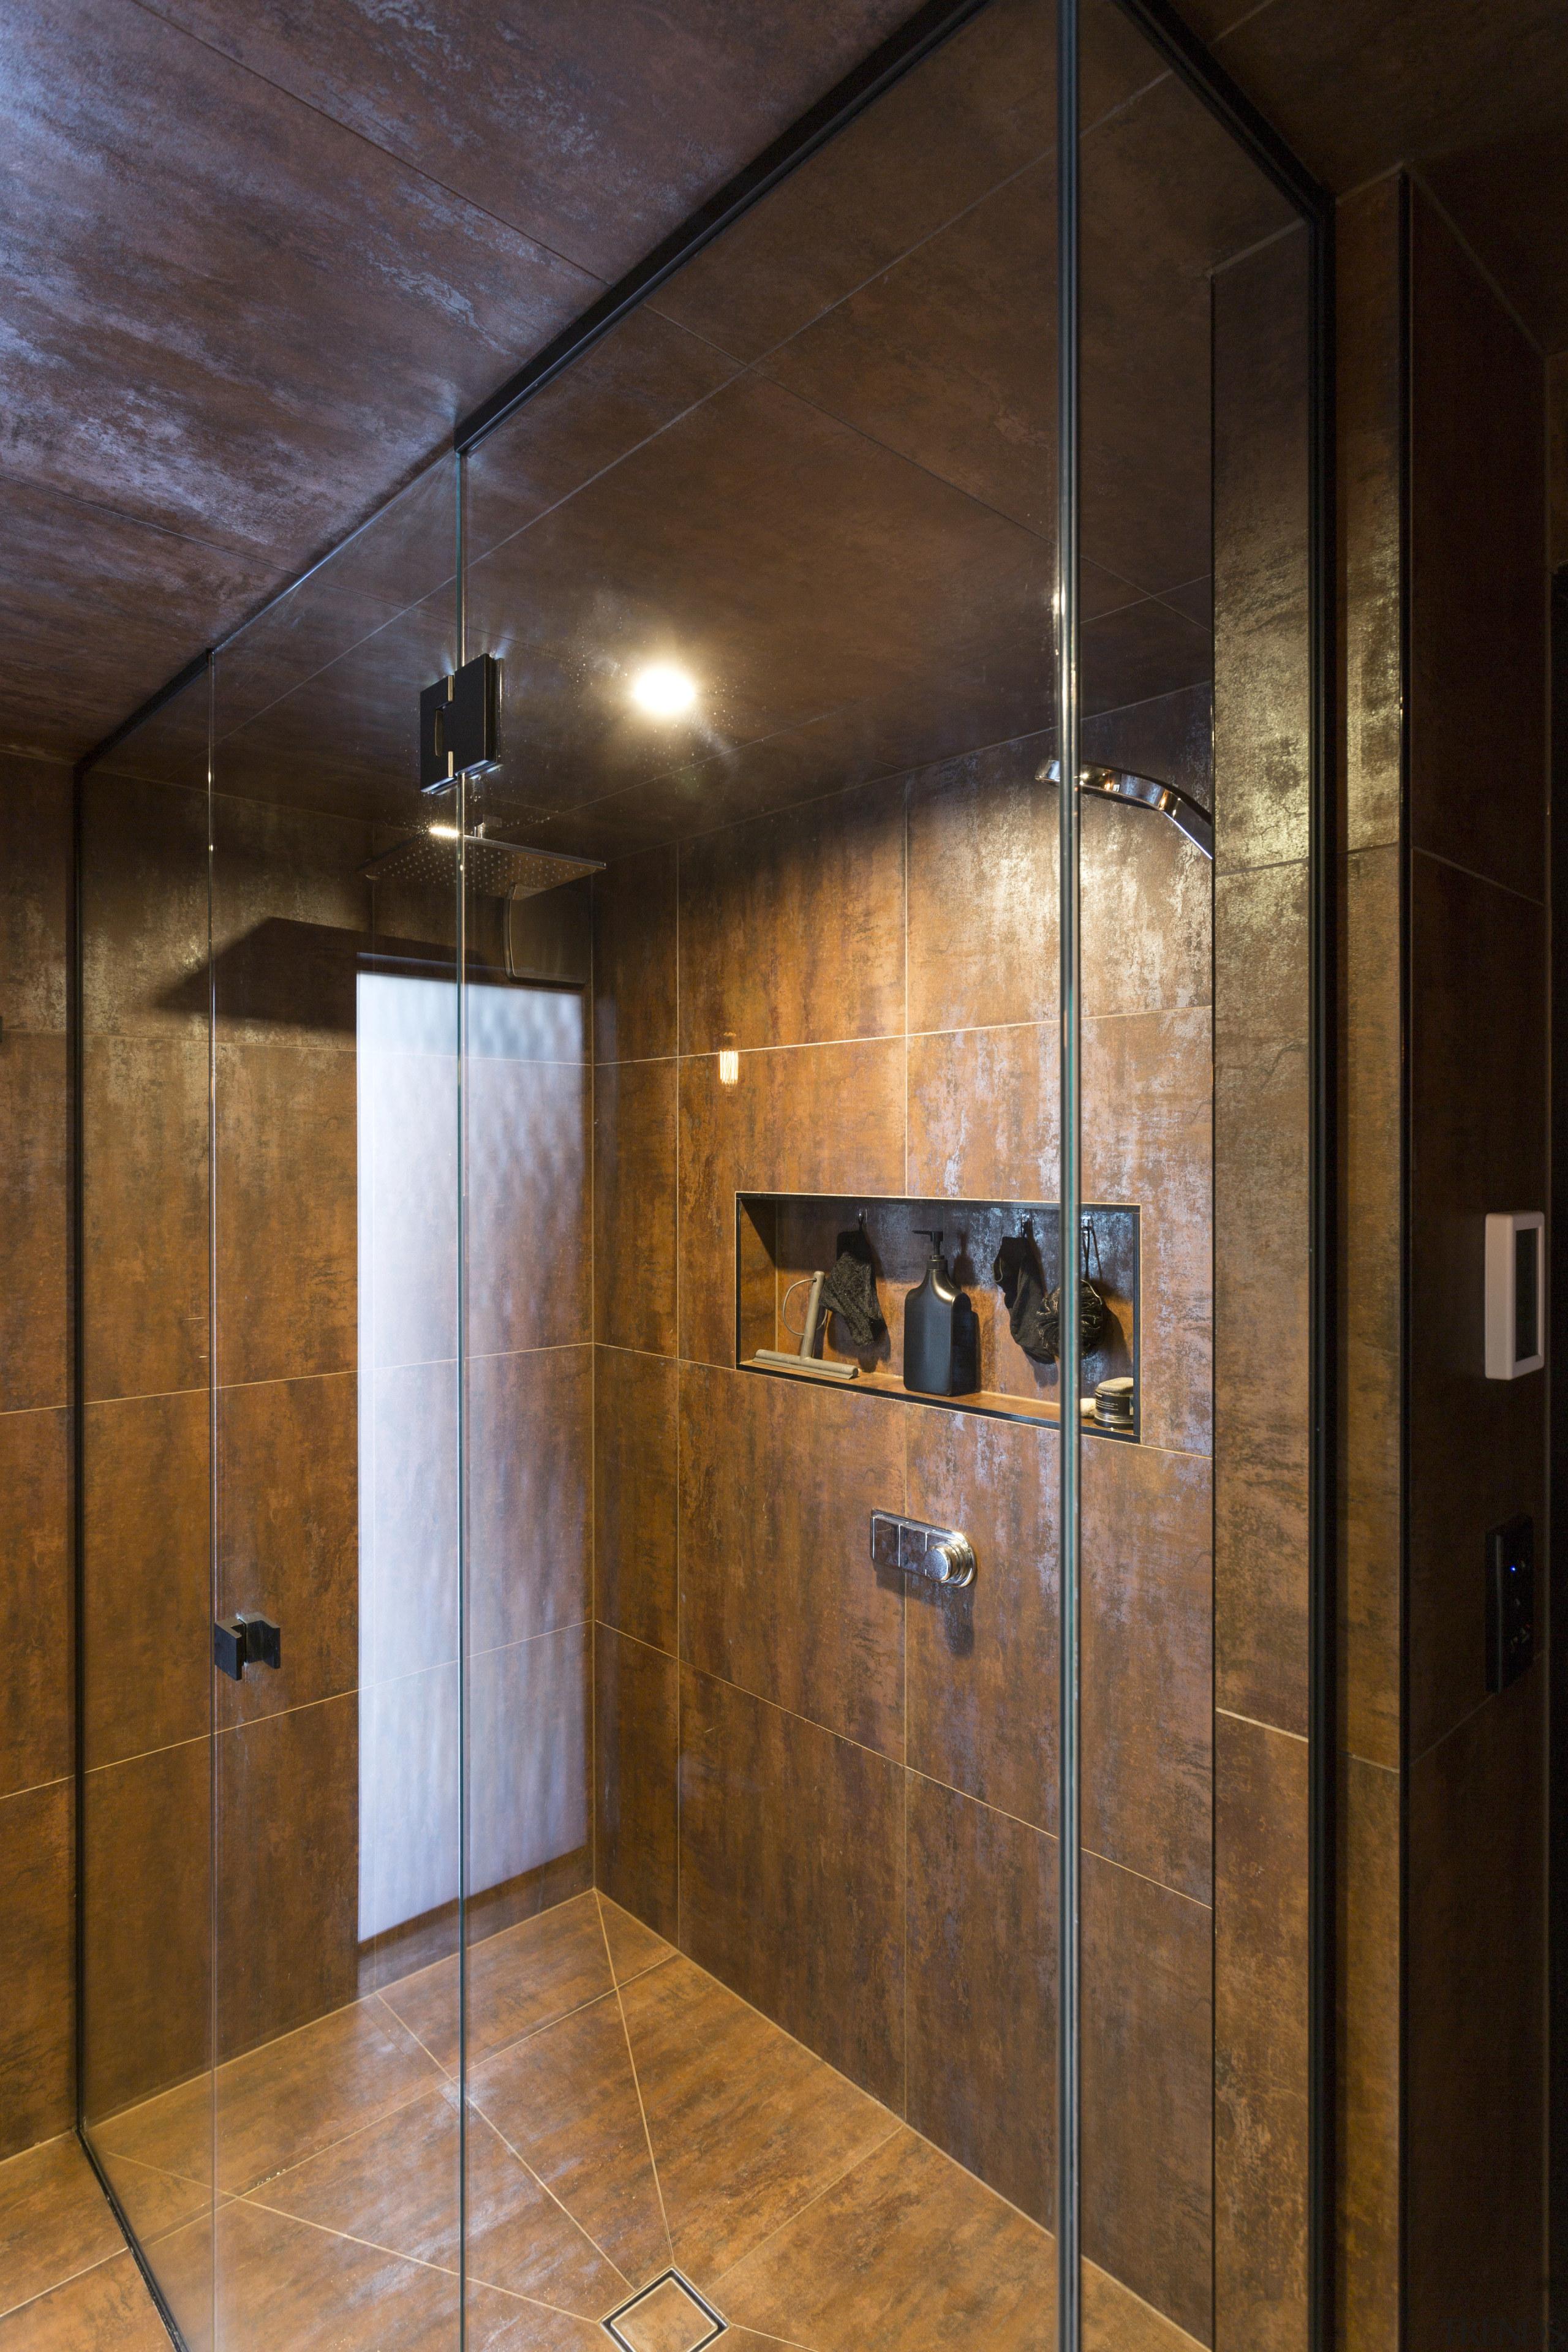 To bring light into this bathroom, designer Hayley bathroom, ceiling, floor, flooring, interior design, lighting, room, tile, wall, wood, wood flooring, brown